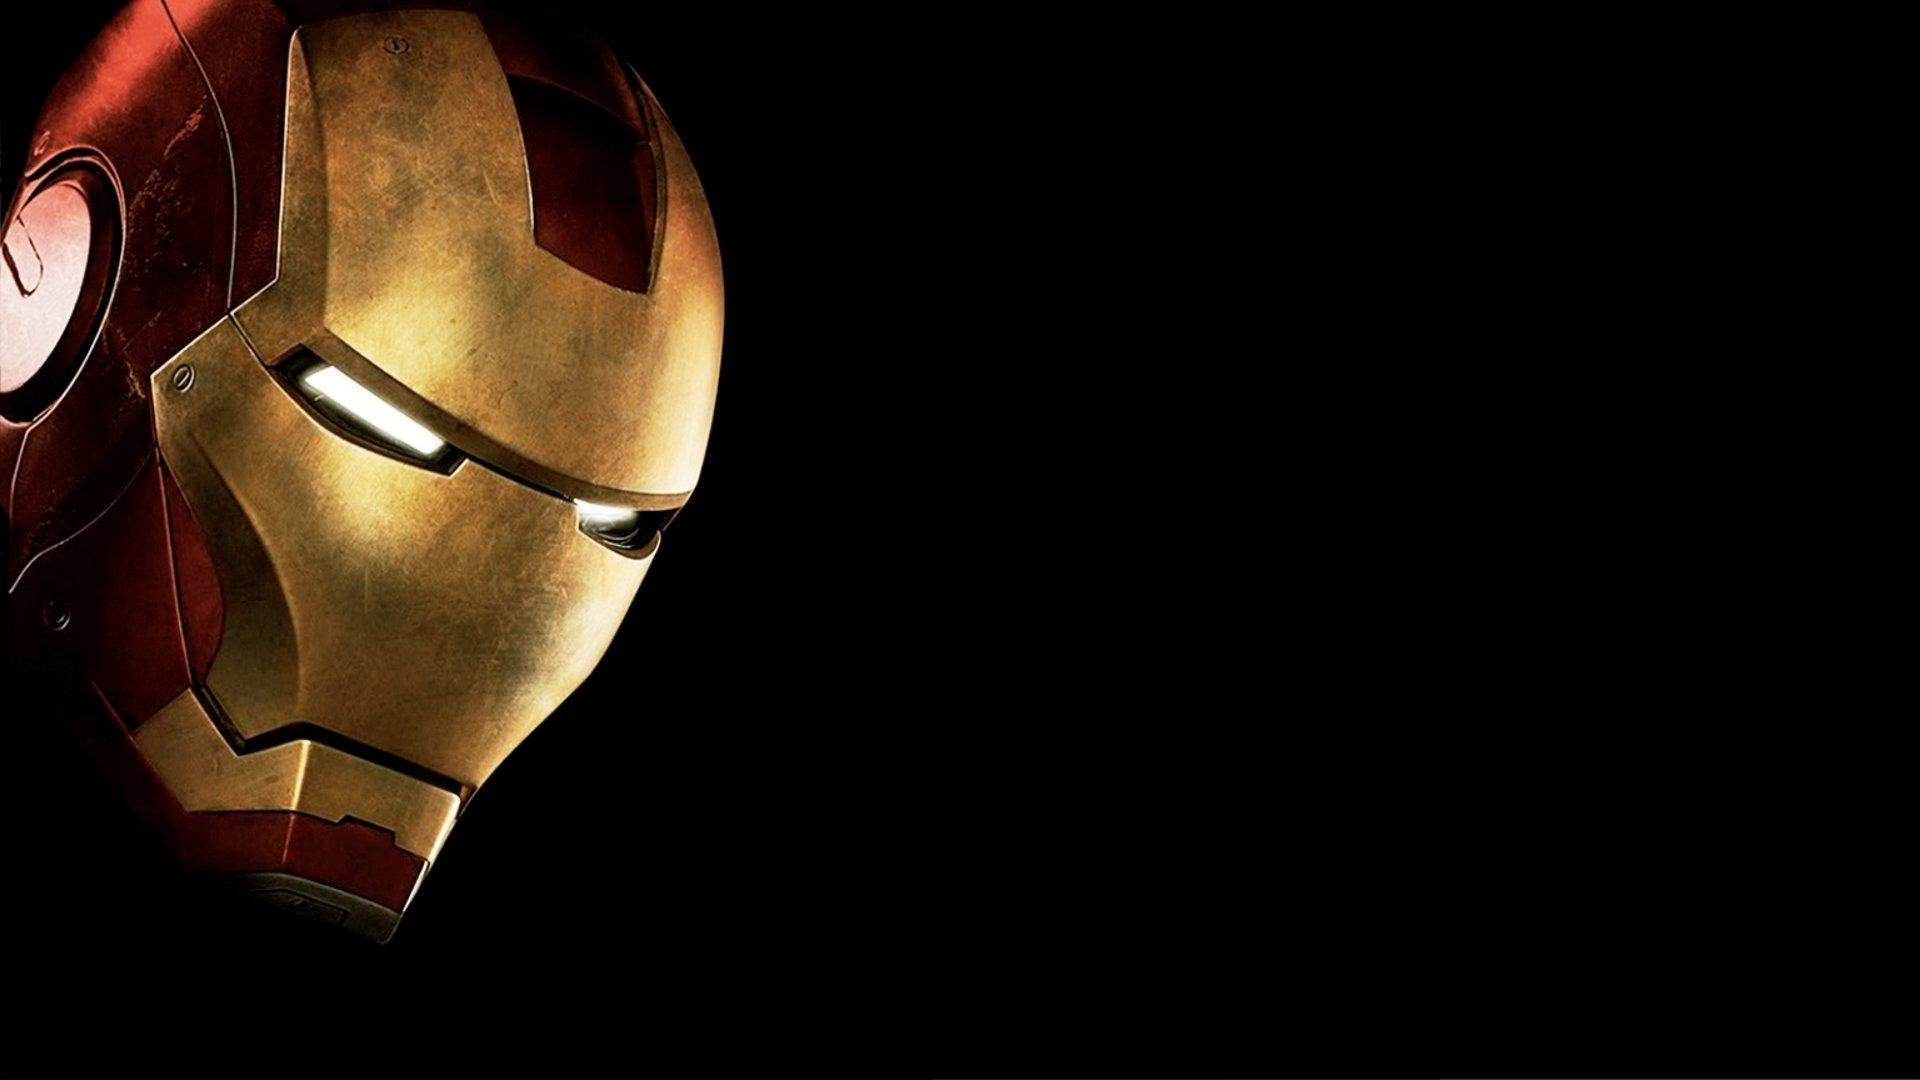 Download Wallpaper Home Screen Iron Man - iron-man-face-wallpaper-21  Pic_1003150.jpg